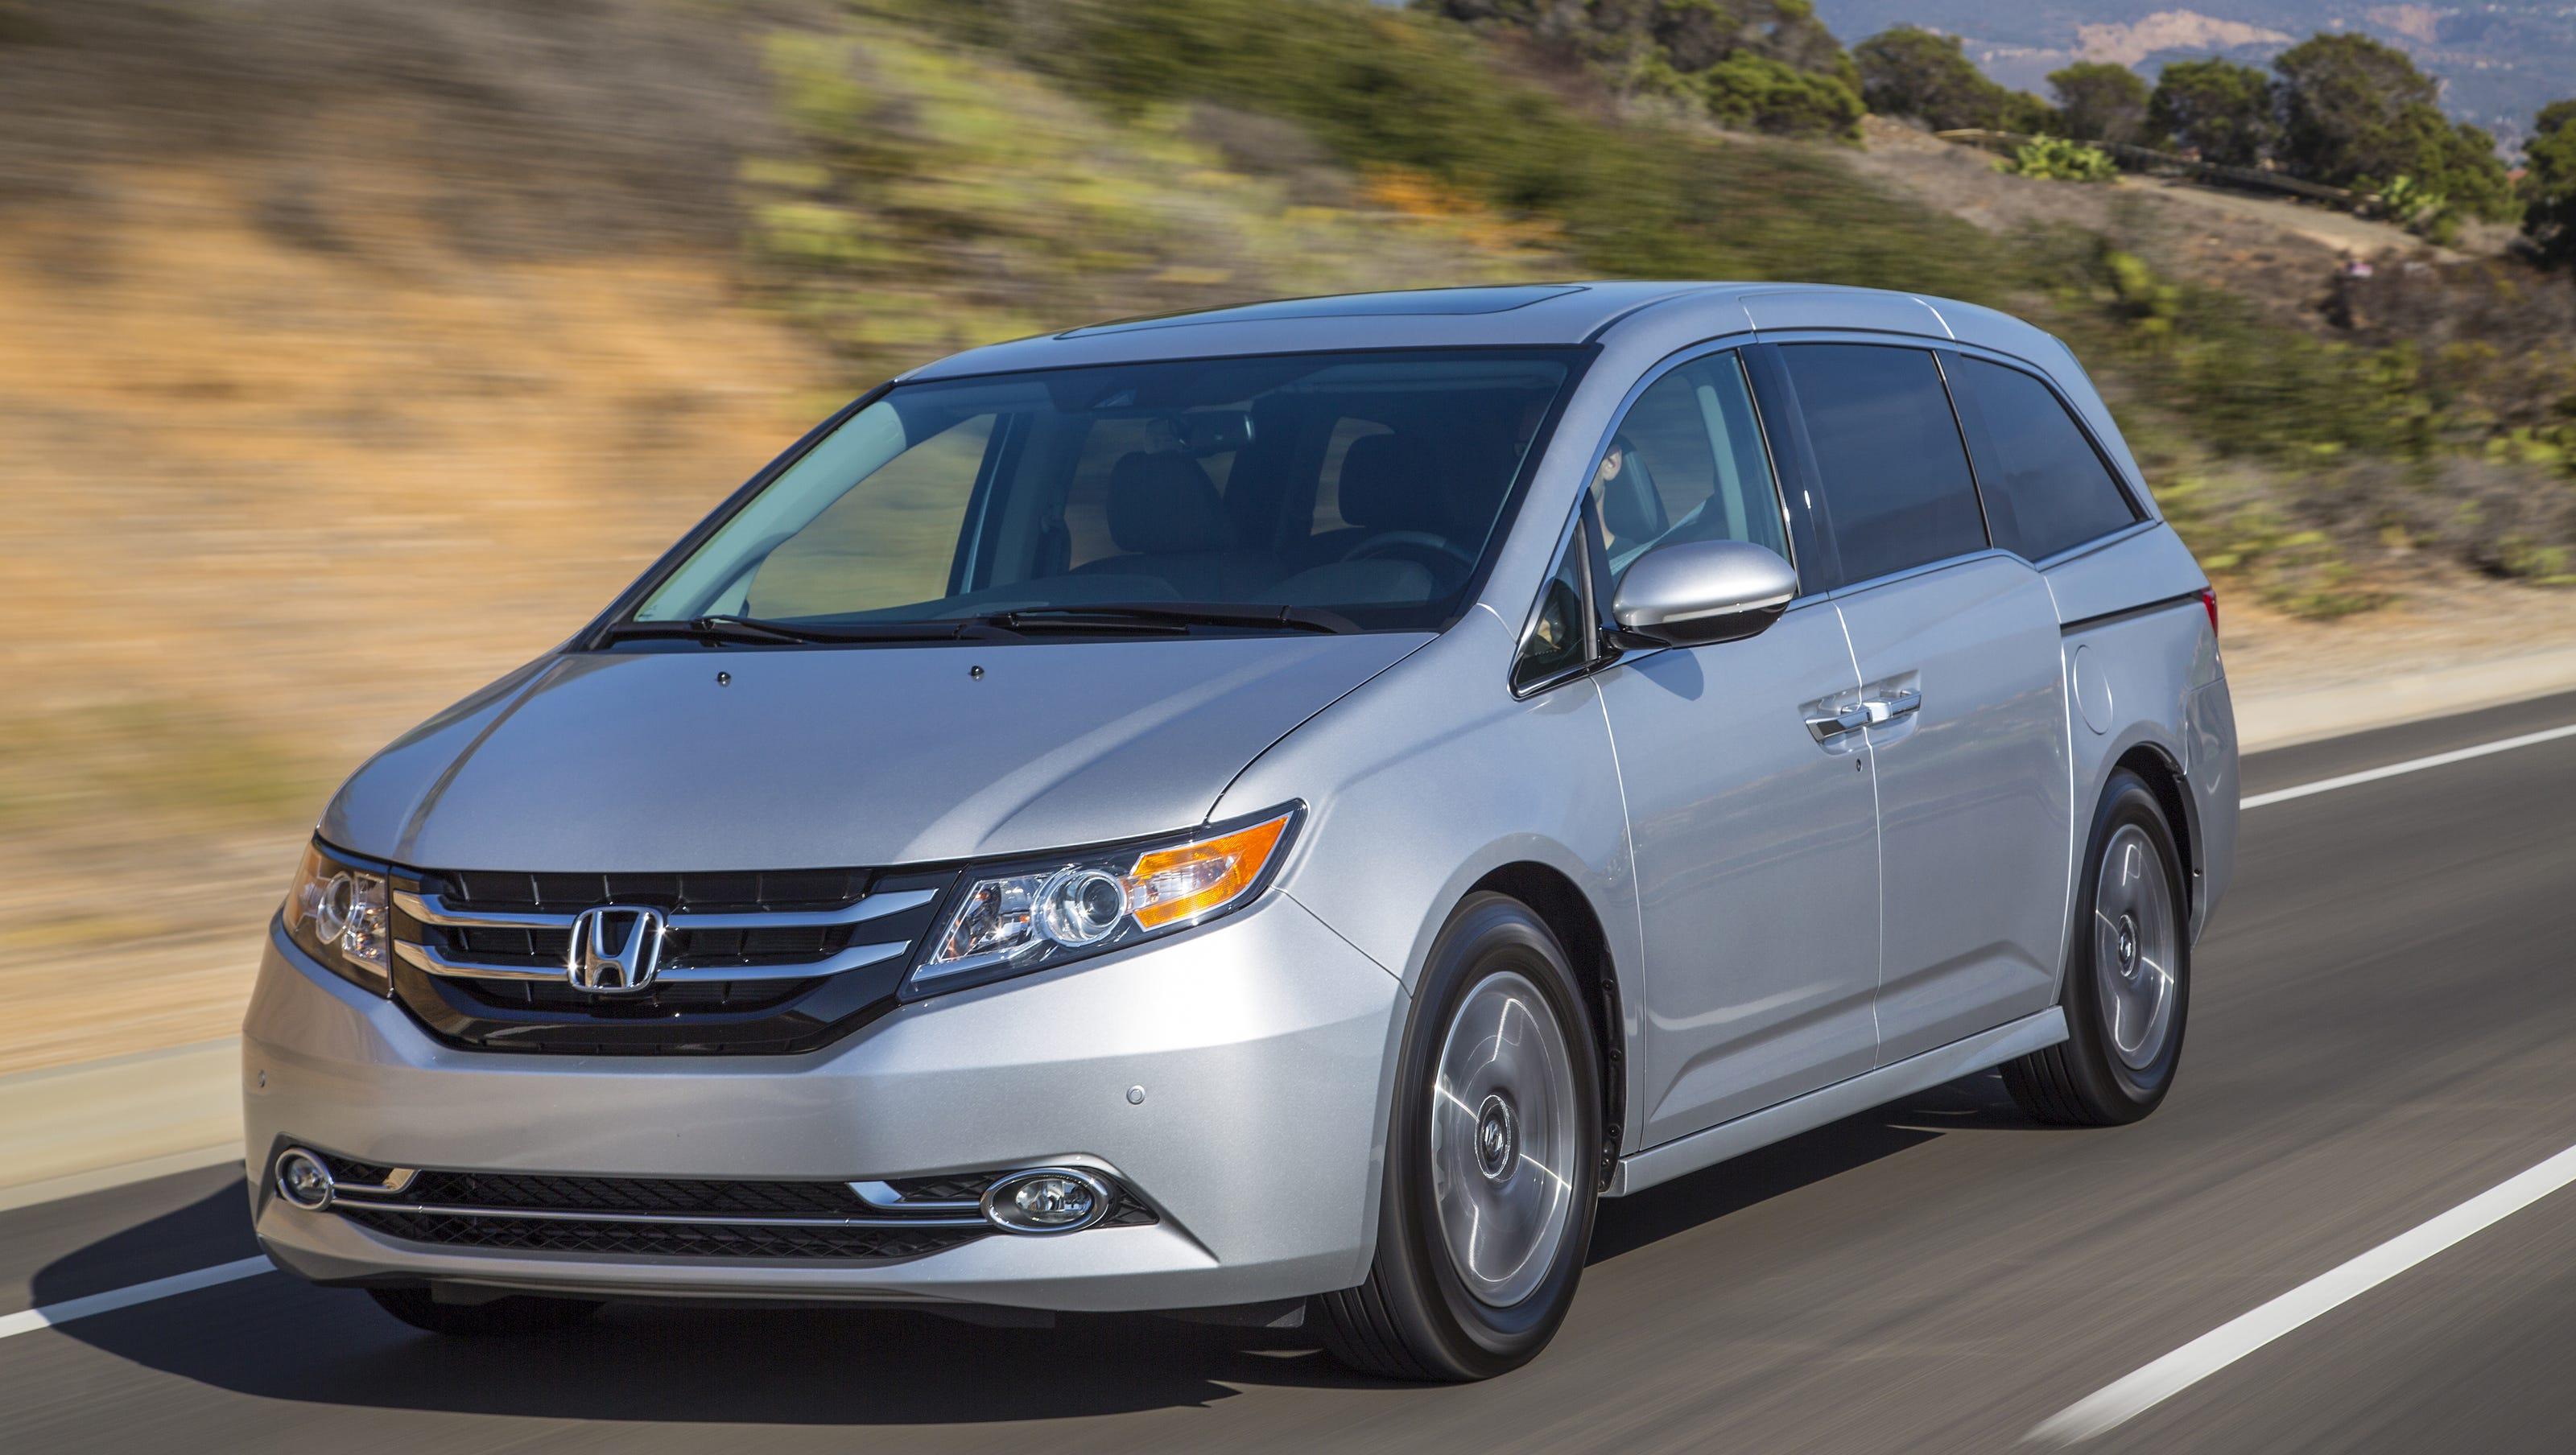 Honda Odyssey: 900,000 minivans recalled